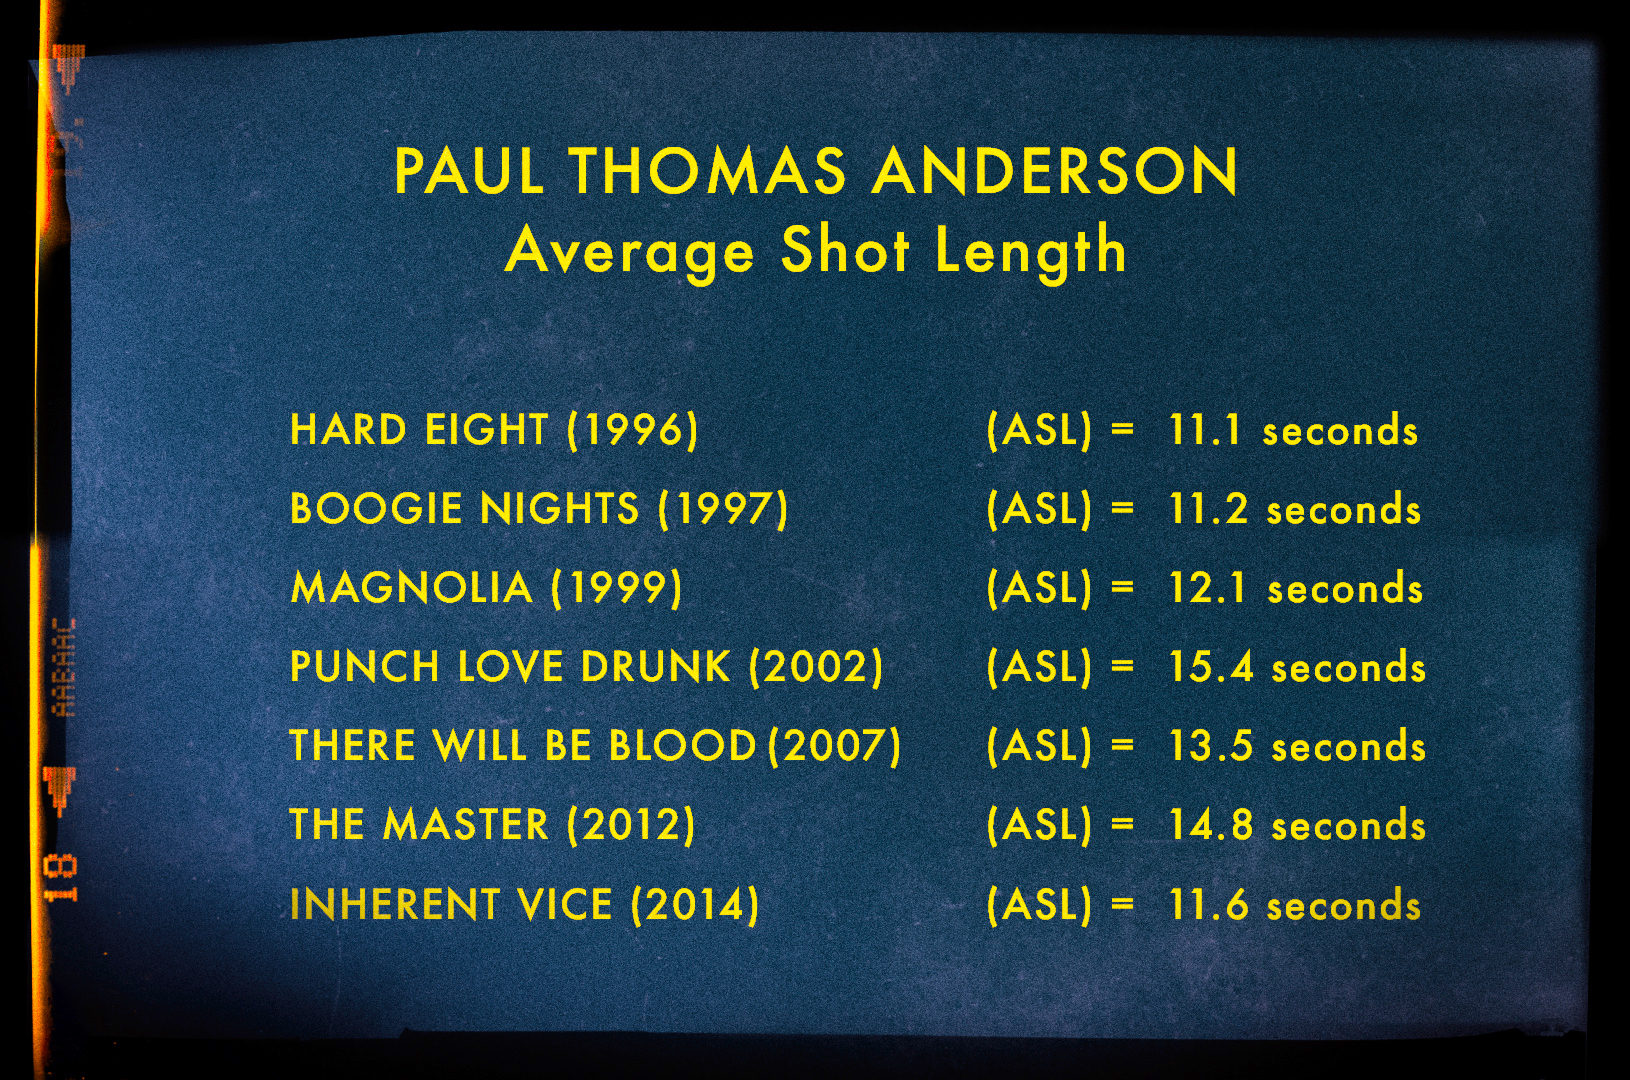 Average Shot Length Archives - Blog